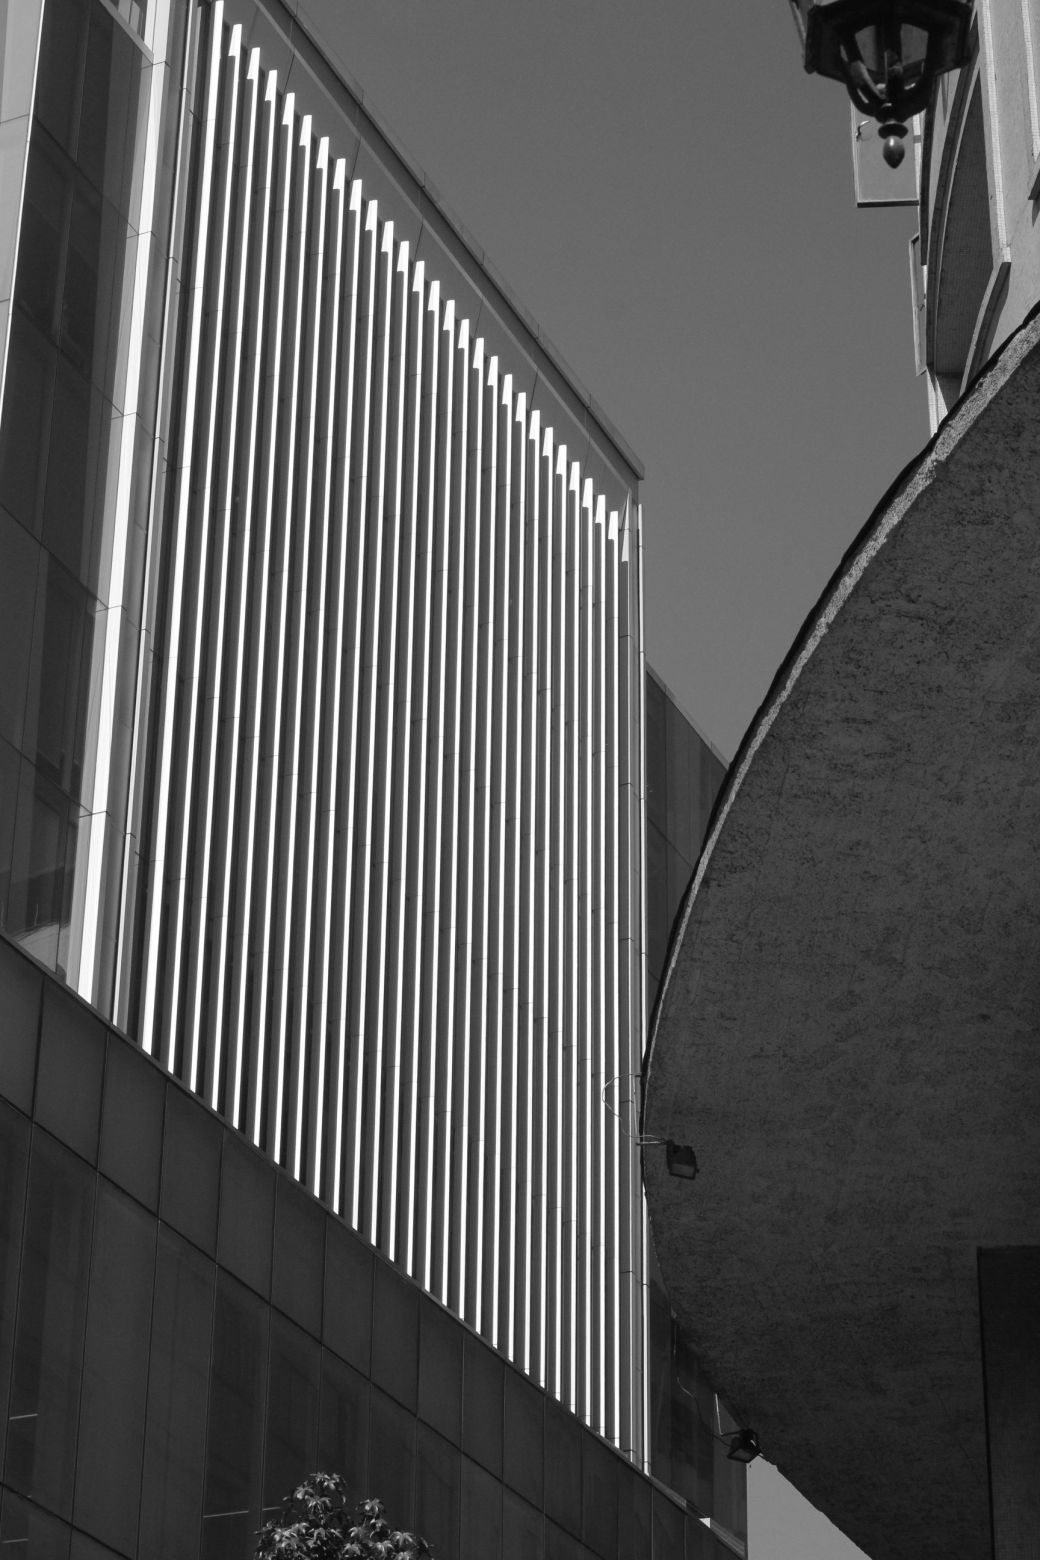 chile santiago modern architecture